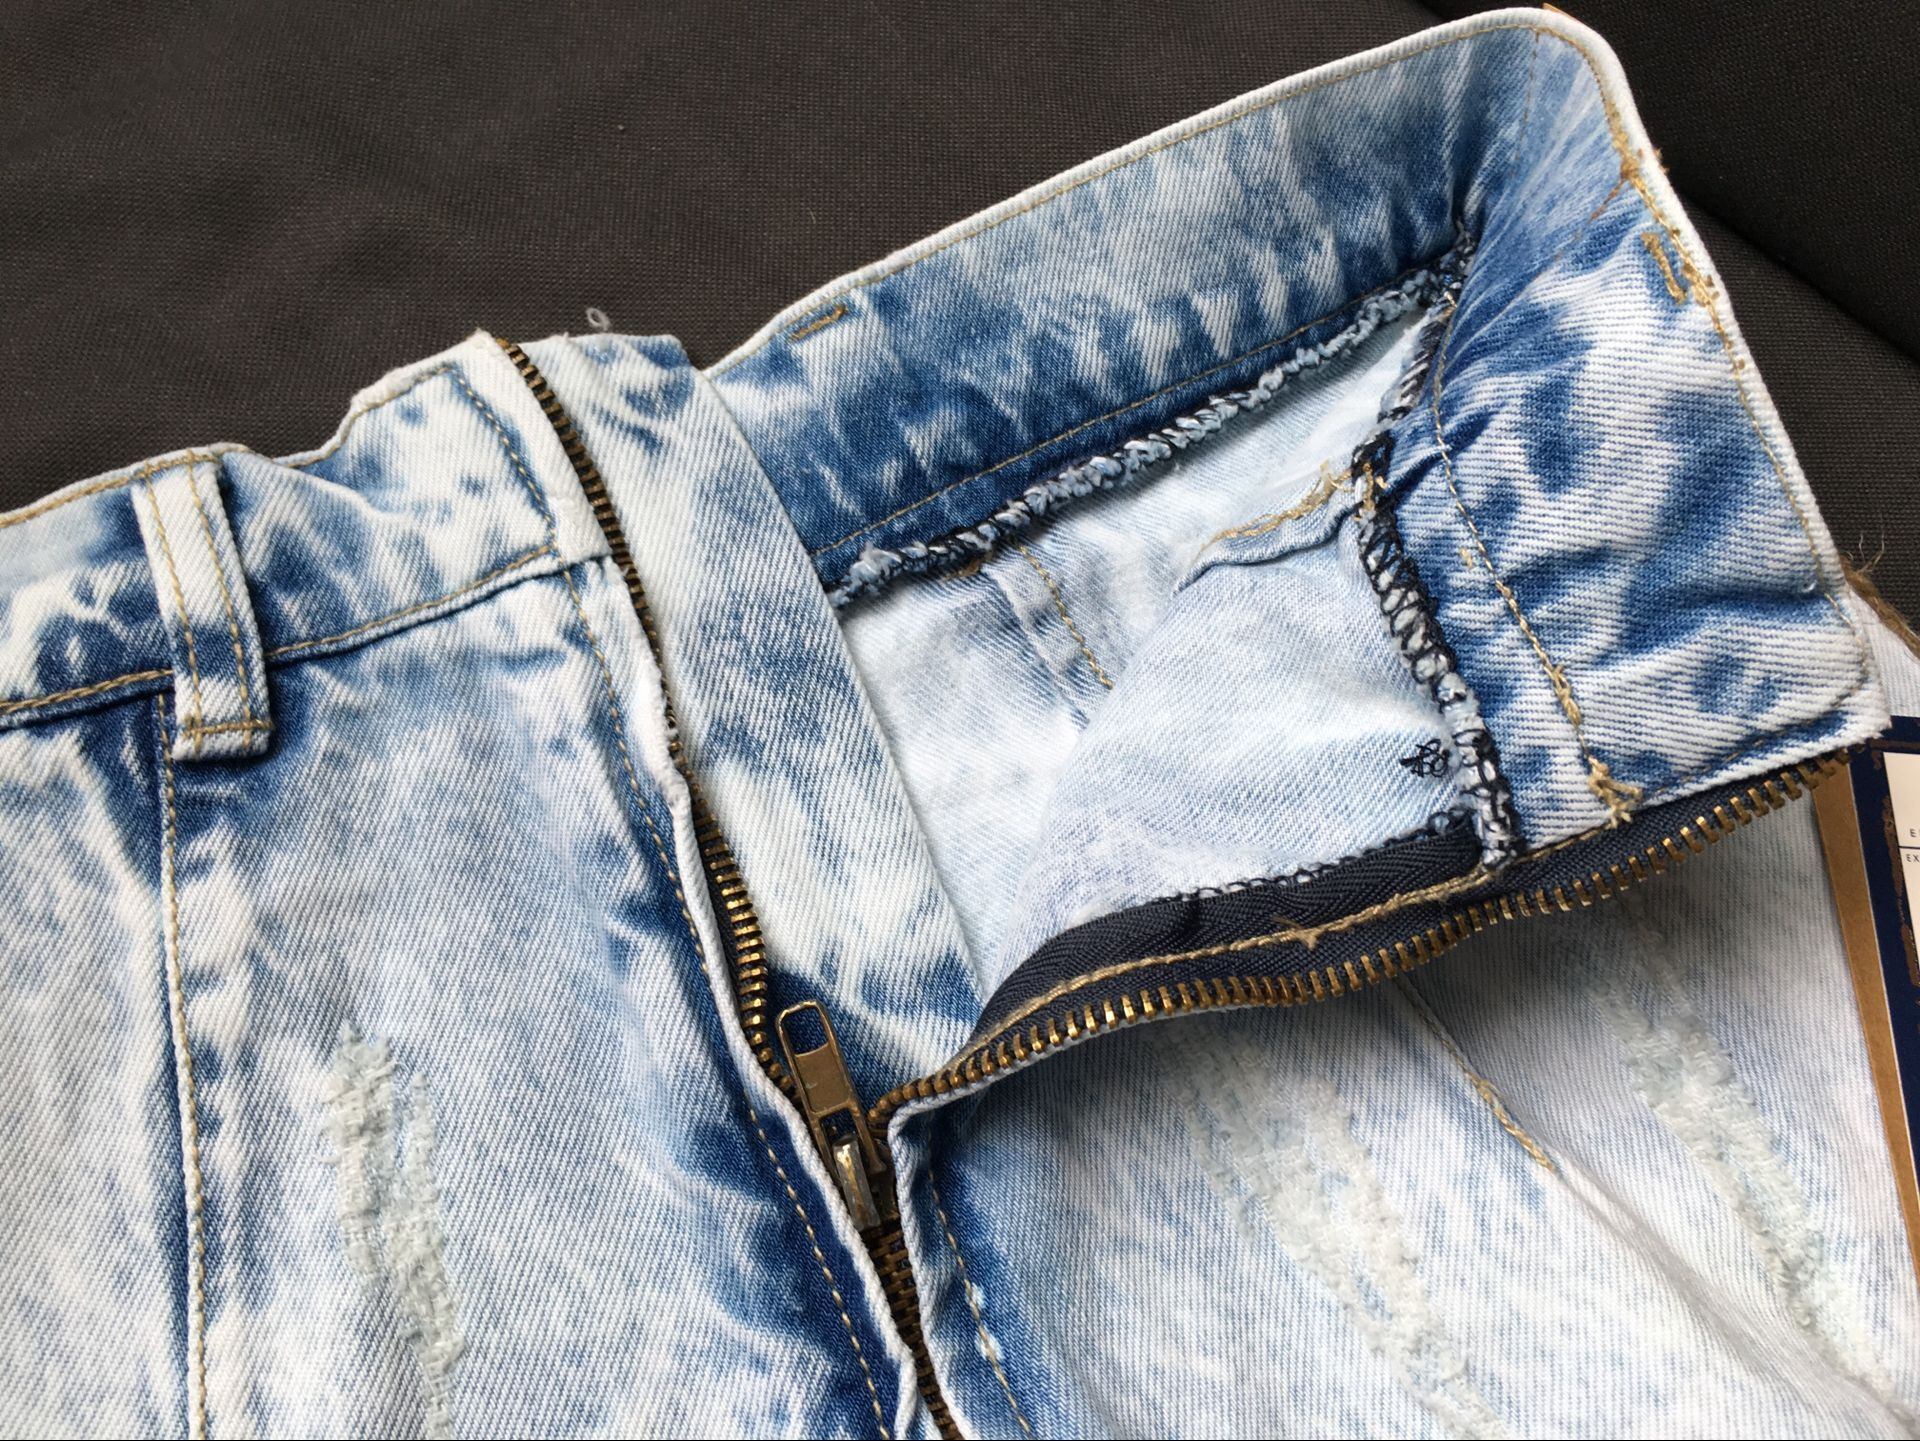 Sexy Jean Moda Vintage Casual Niñas 2018 Falda Mujer Ripped Vaquera Para Azul Mujeres Damas Verano FwpqdpP